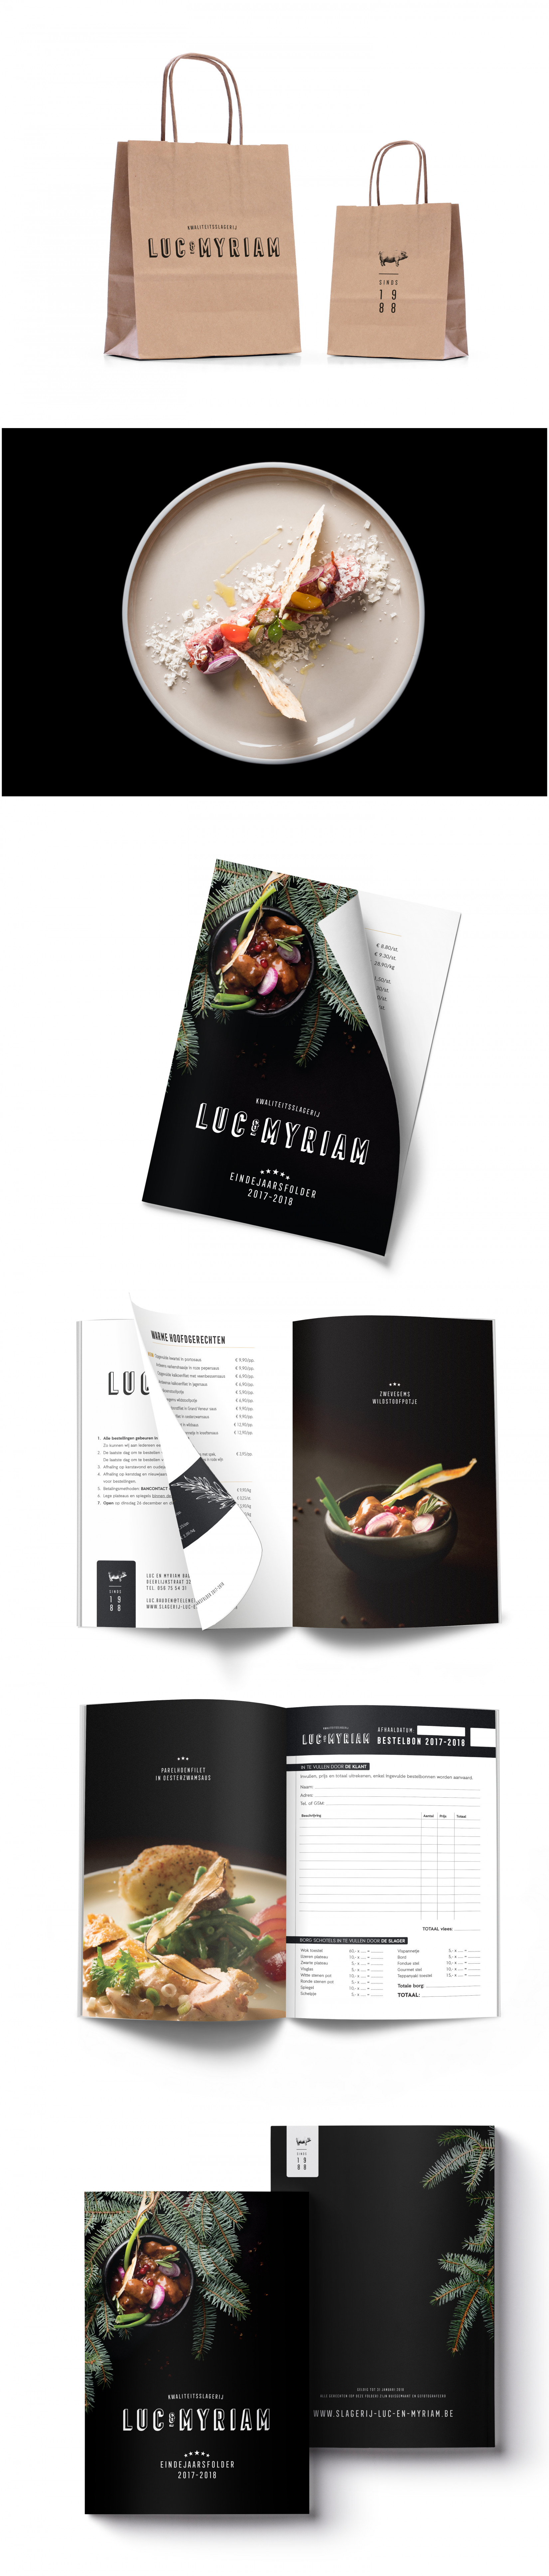 LUC&MYRIAM_LogoPresentatie_Case_01.4.jpg